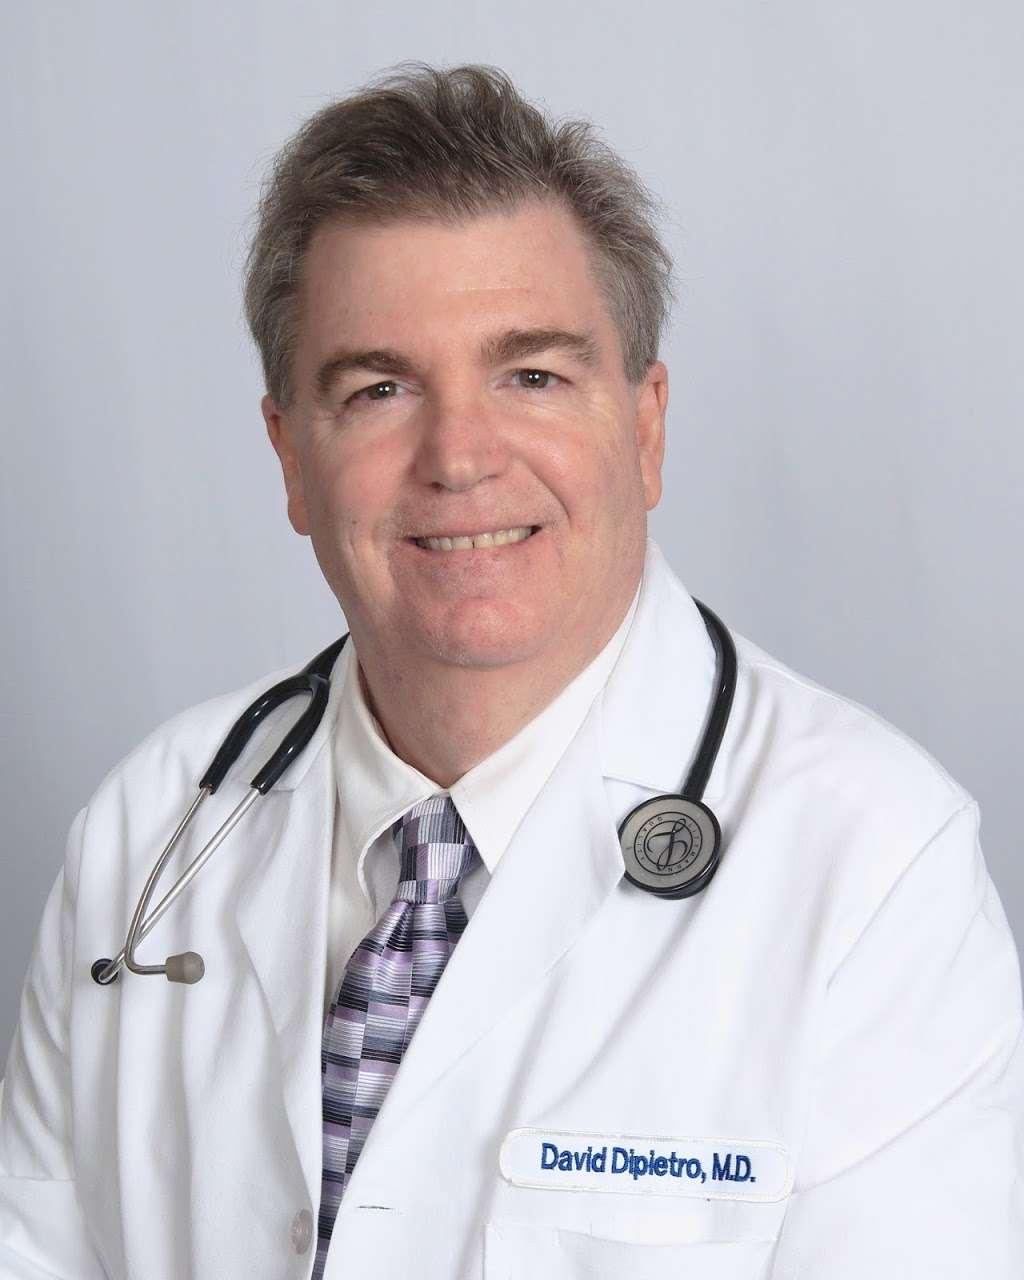 David DiPietro, MD - doctor    Photo 2 of 4   Address: 2325 Heritage Center Dr, Furlong, PA 18925, USA   Phone: (267) 247-5100